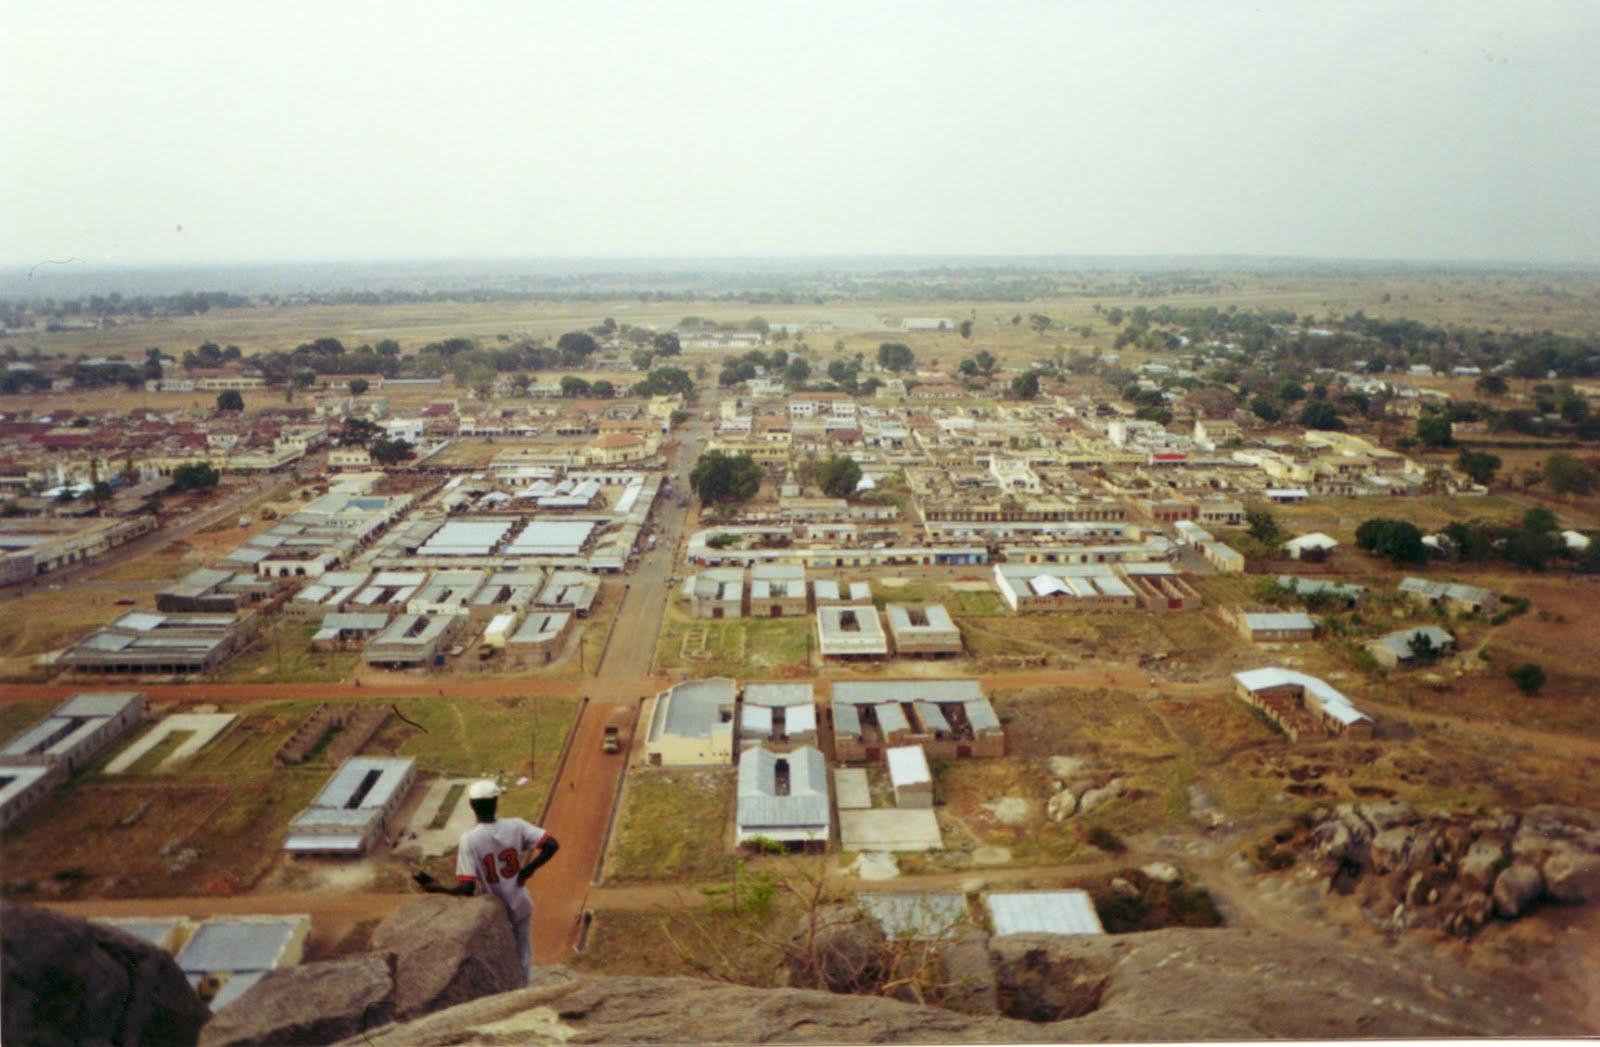 #Soroti, Cidade de Uganda